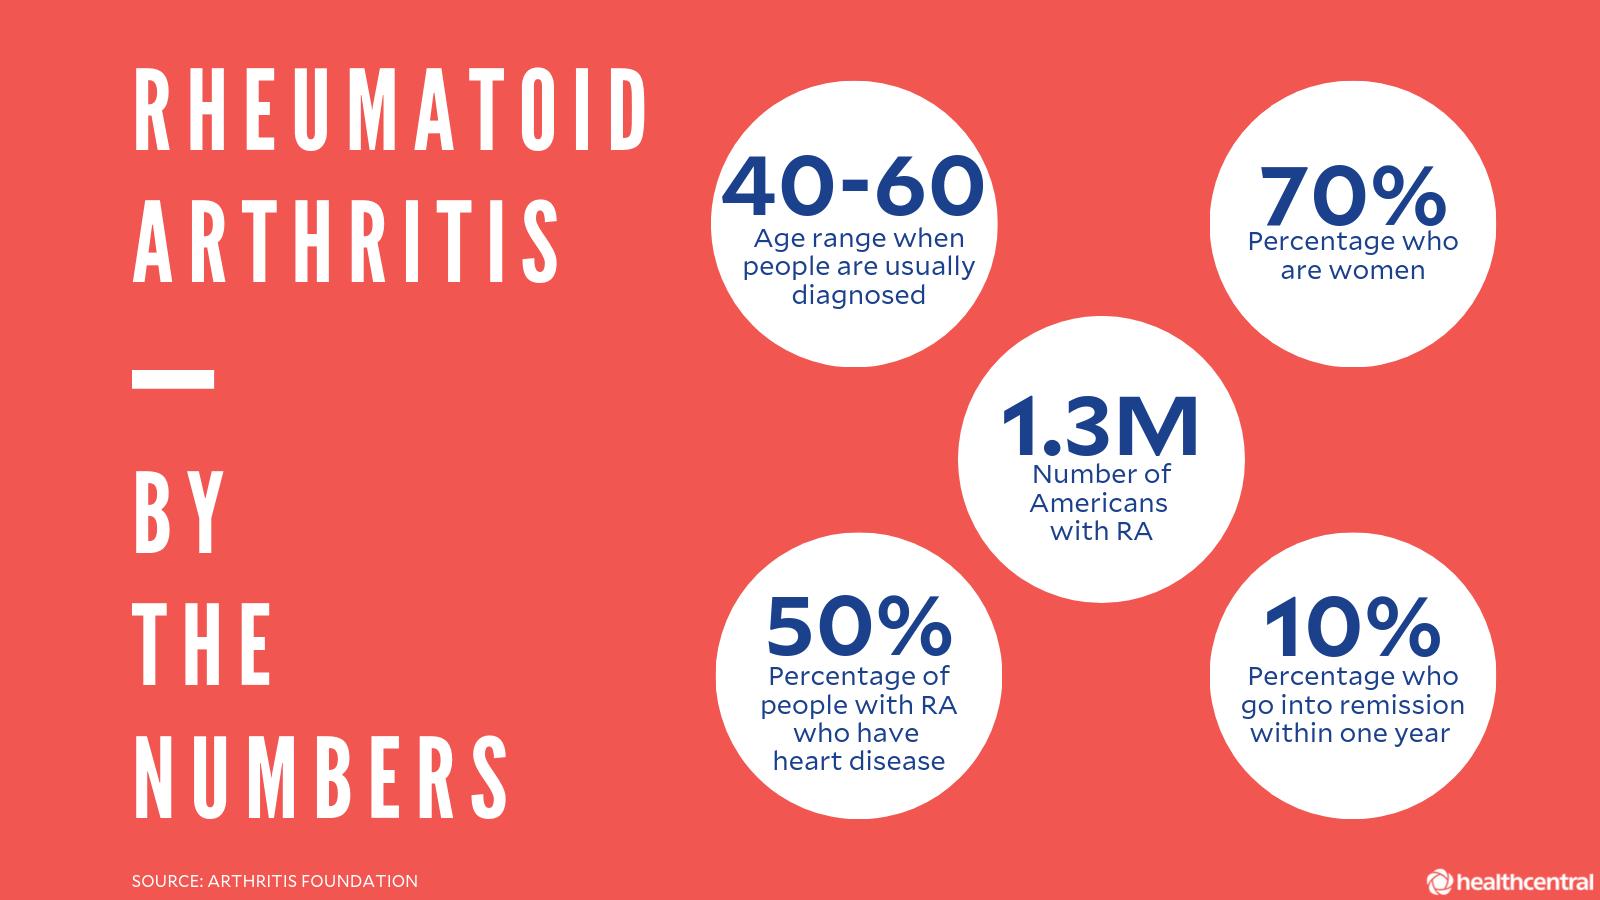 Rheumatoid Arthritis Symptoms Causes Treatments And More